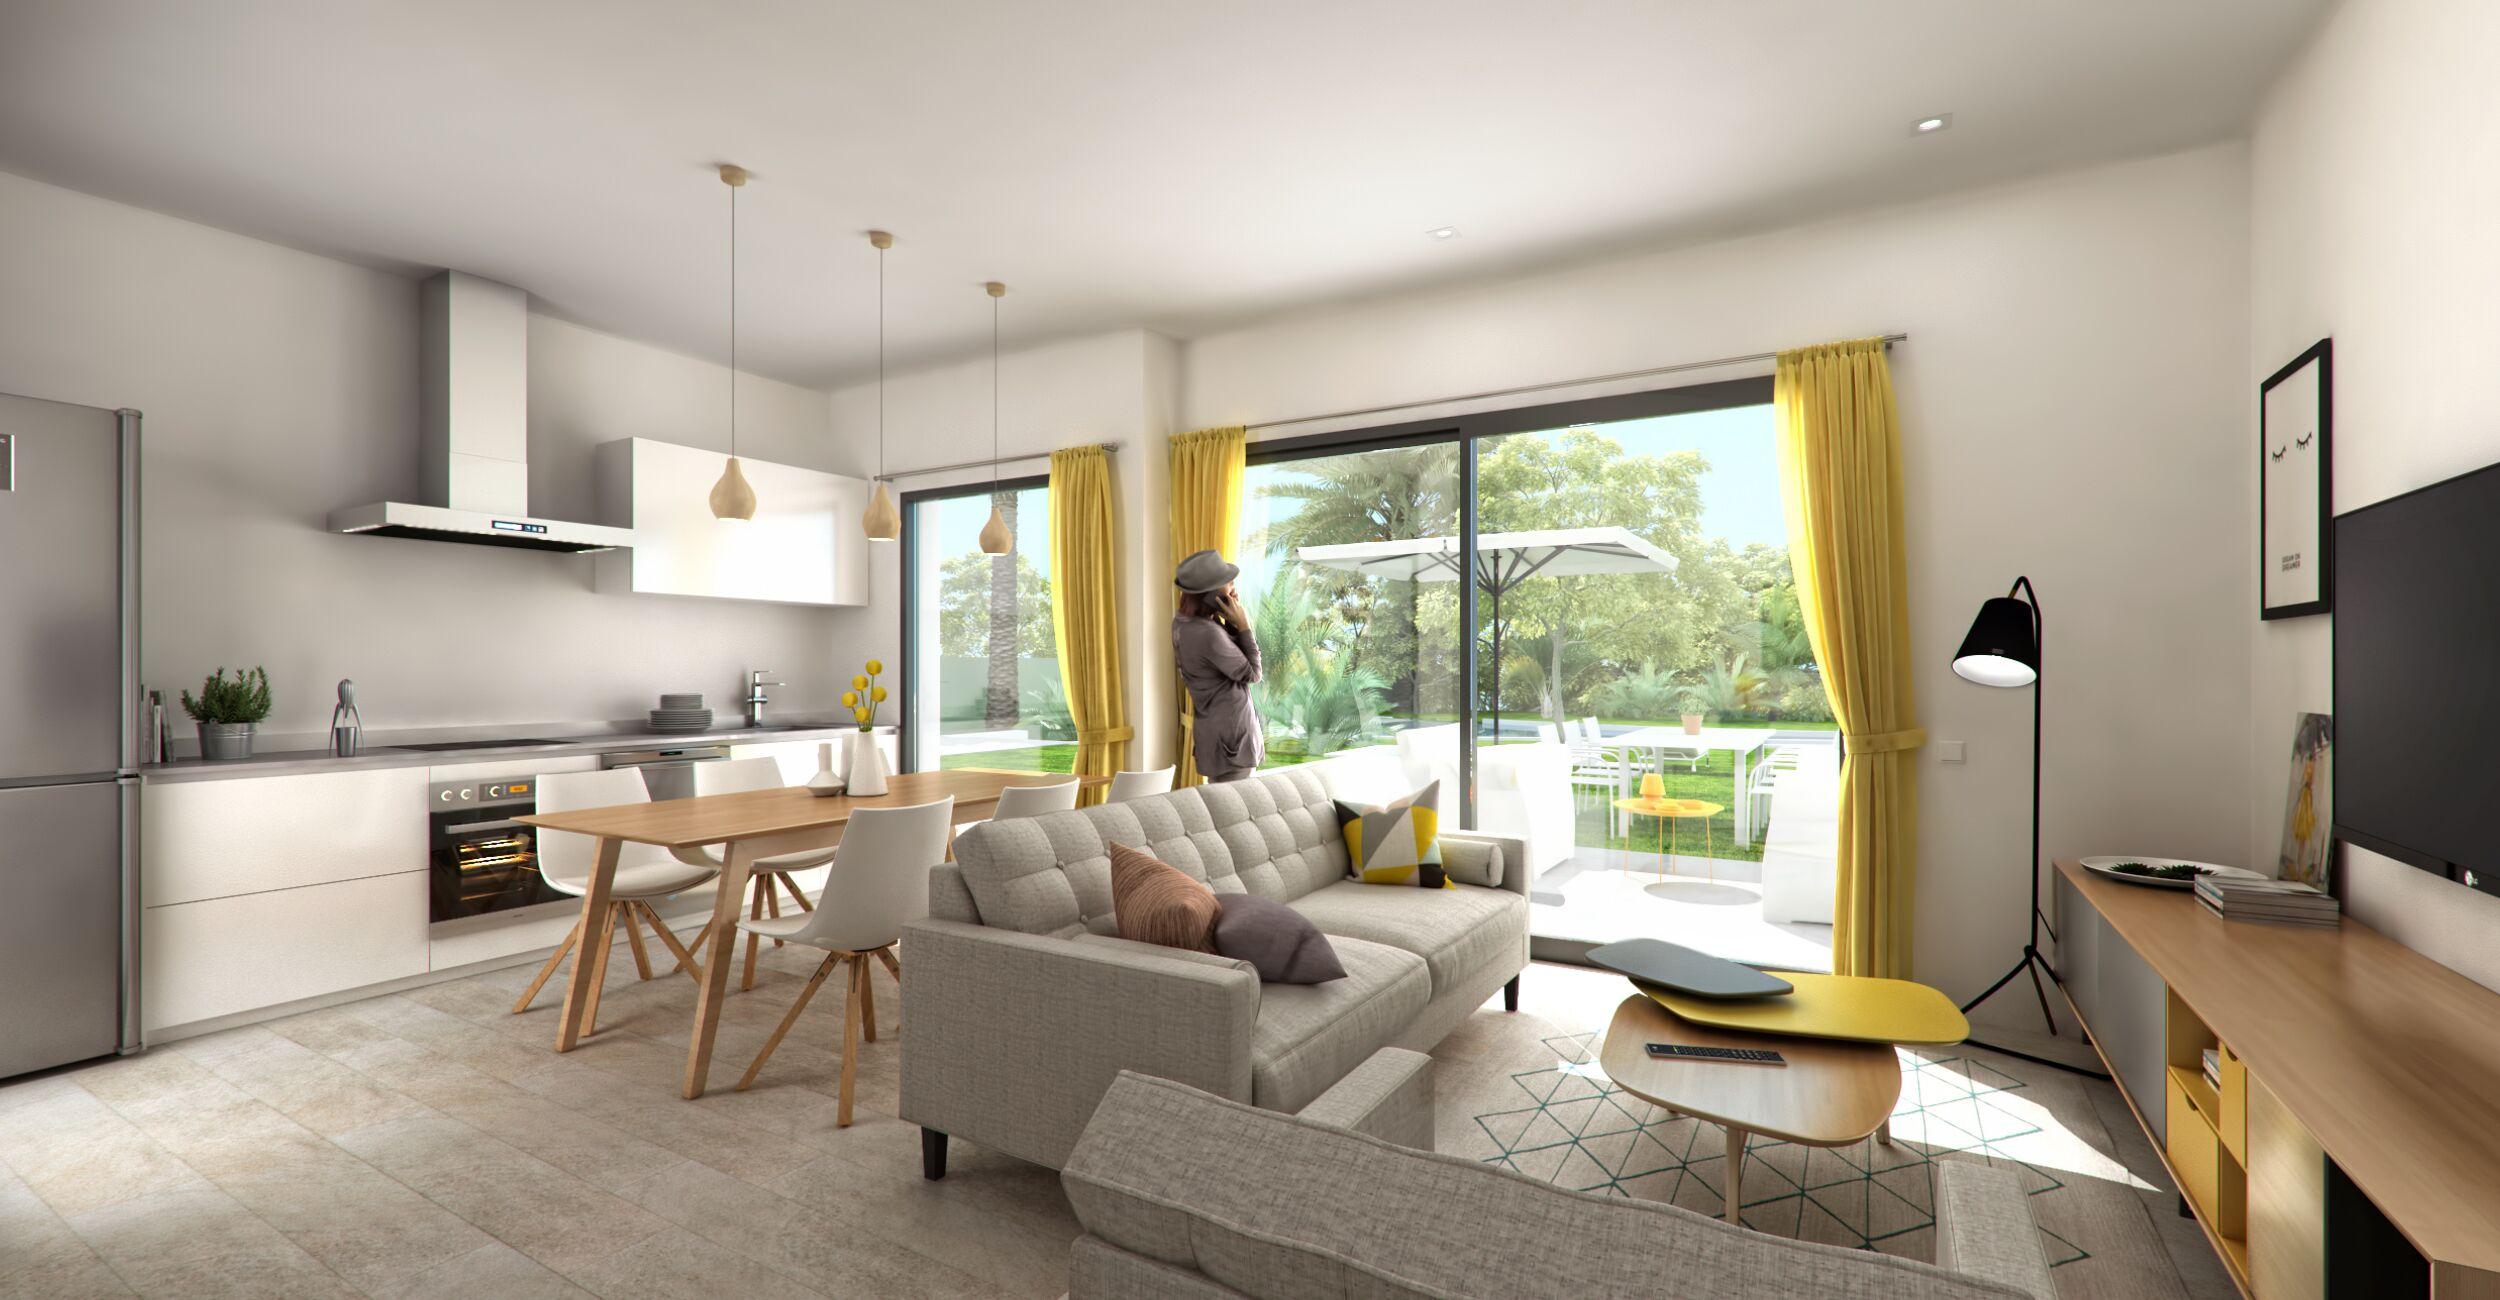 kf943375: Apartment for sale in Torre de la Horadada